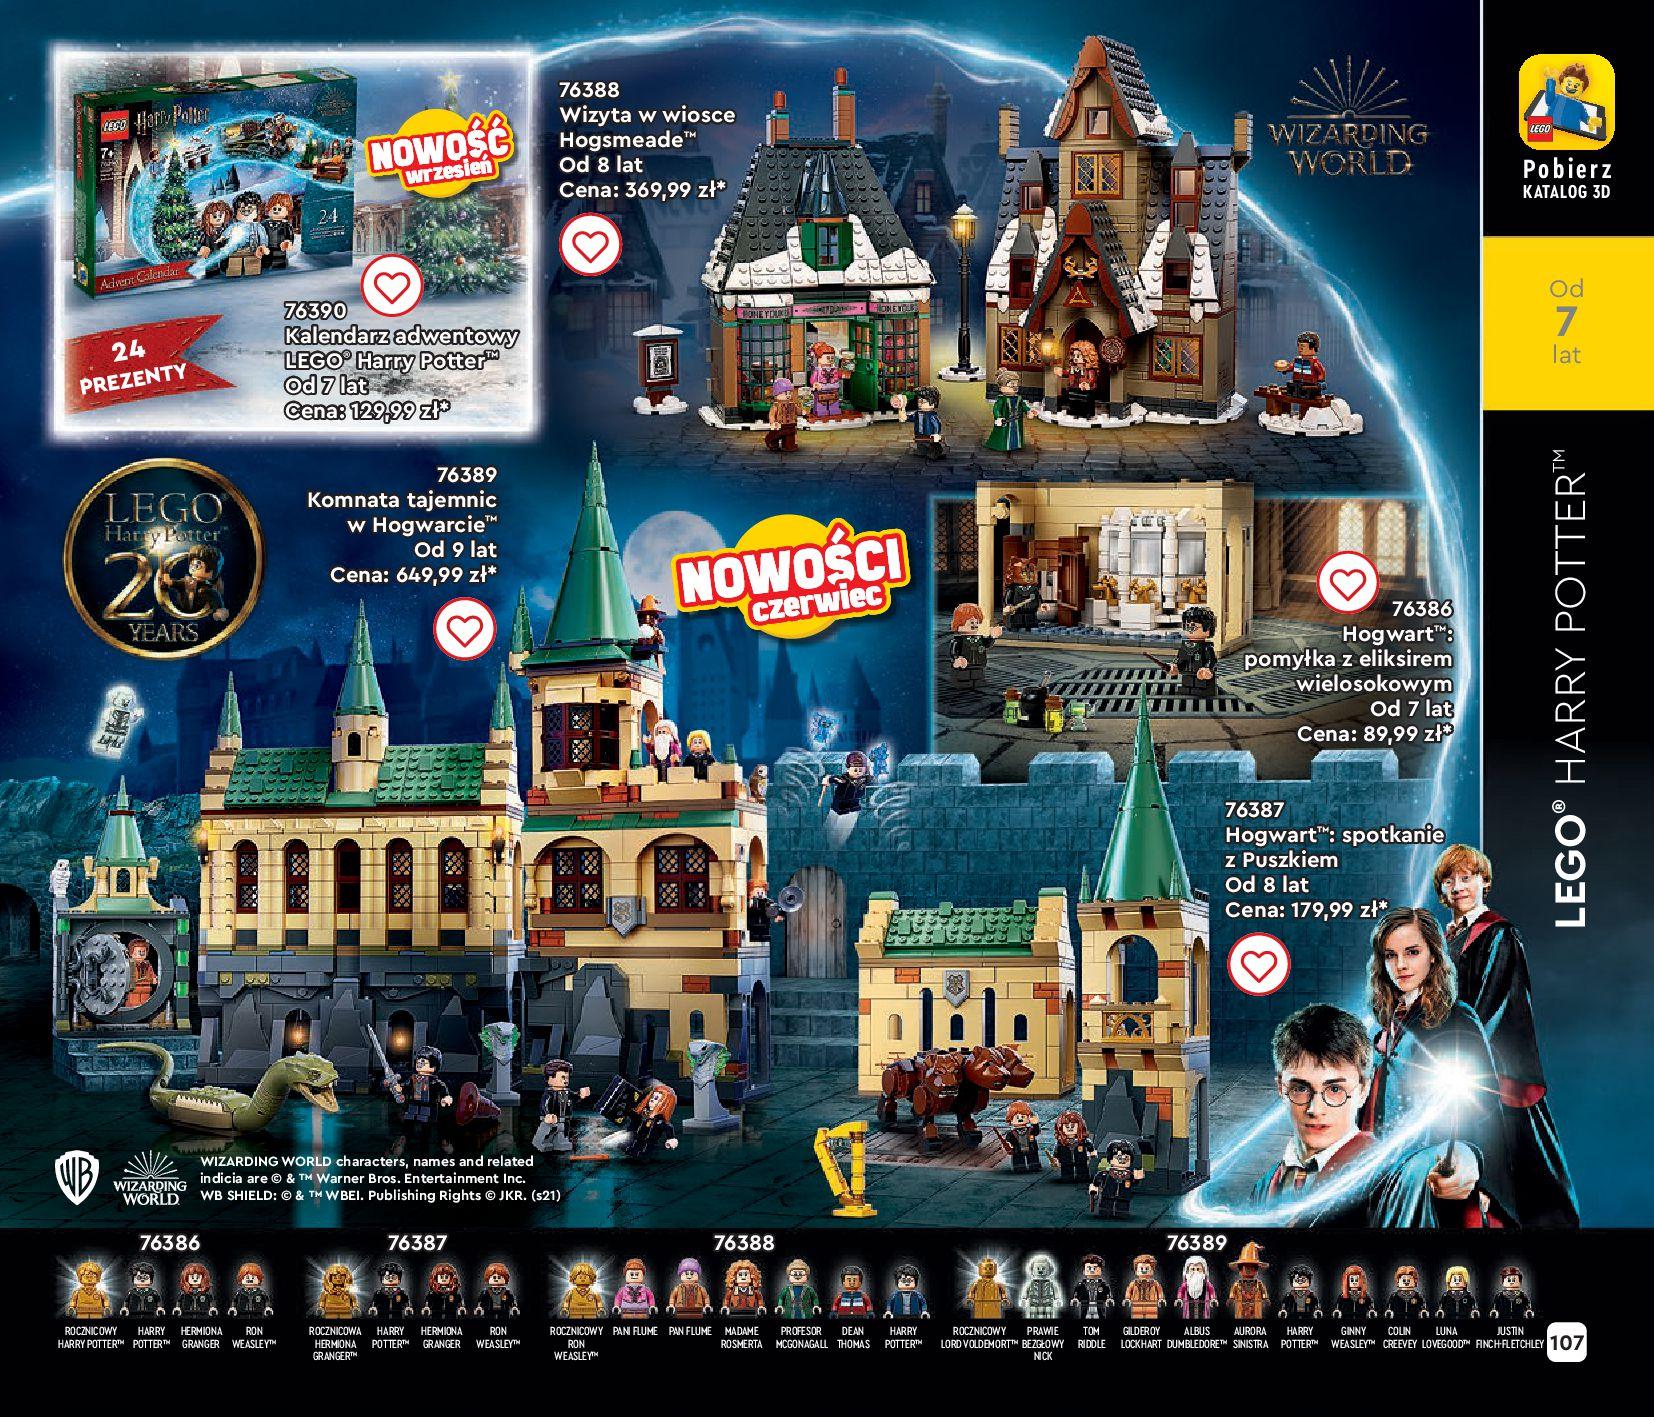 Gazetka LEGO: Gazetka LEGO - katalog 2021-06-30 page-107